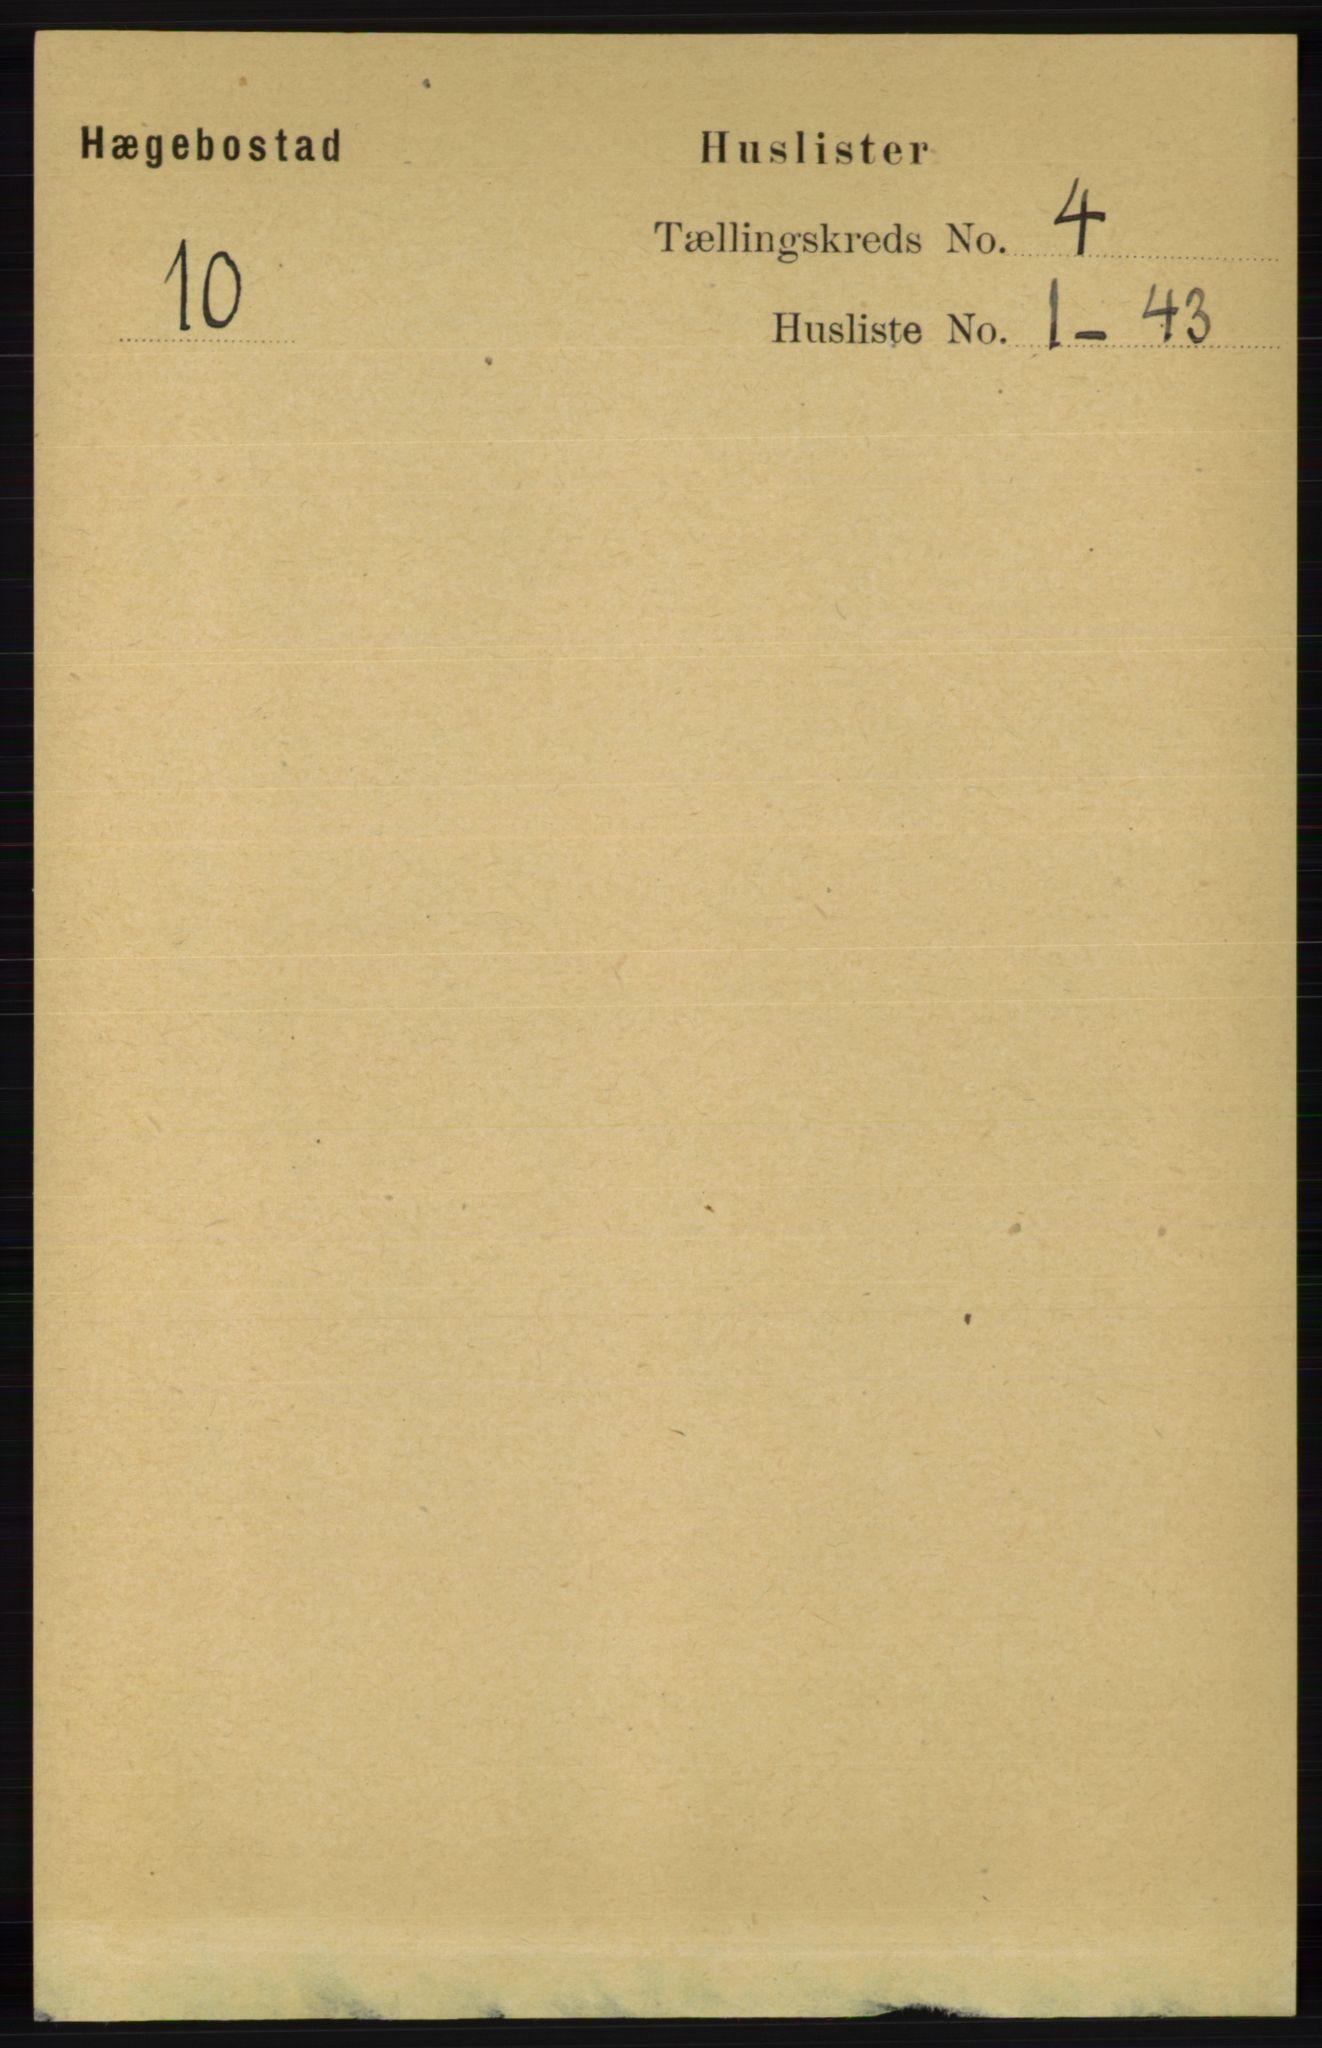 RA, Folketelling 1891 for 1034 Hægebostad herred, 1891, s. 1144